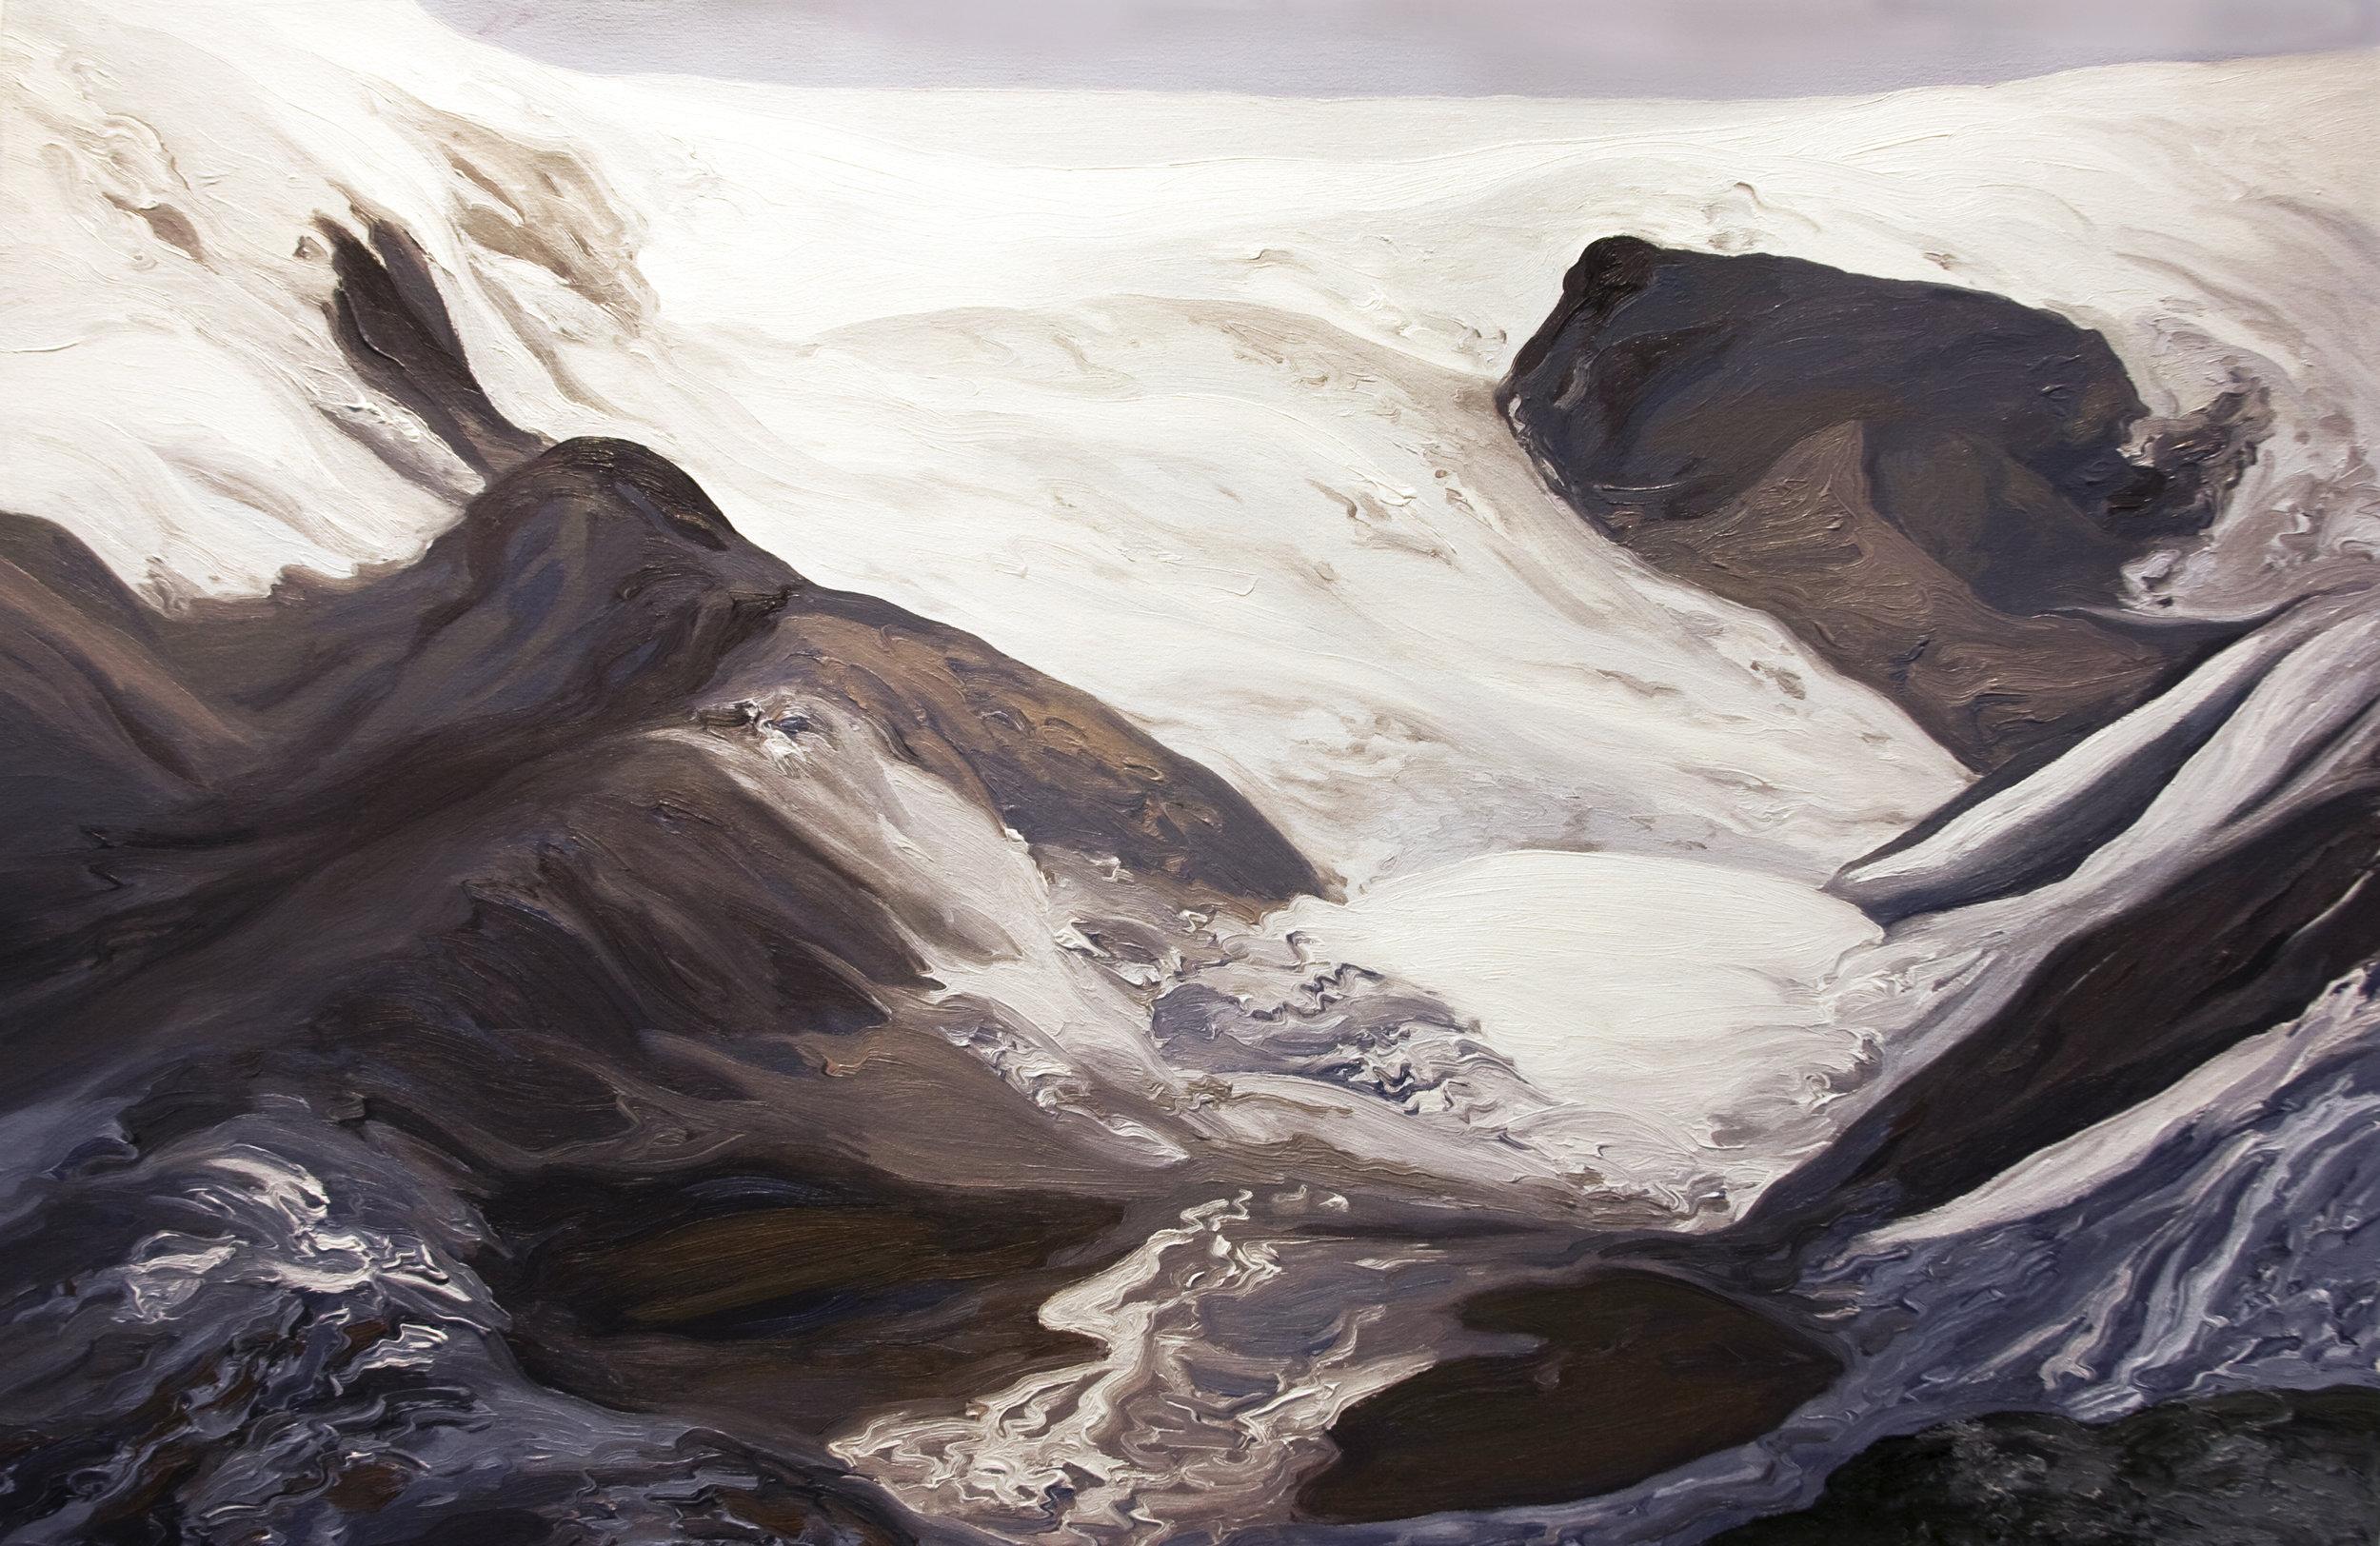 Qori Kalis Glacier #1, 1978, after Henry Brecher